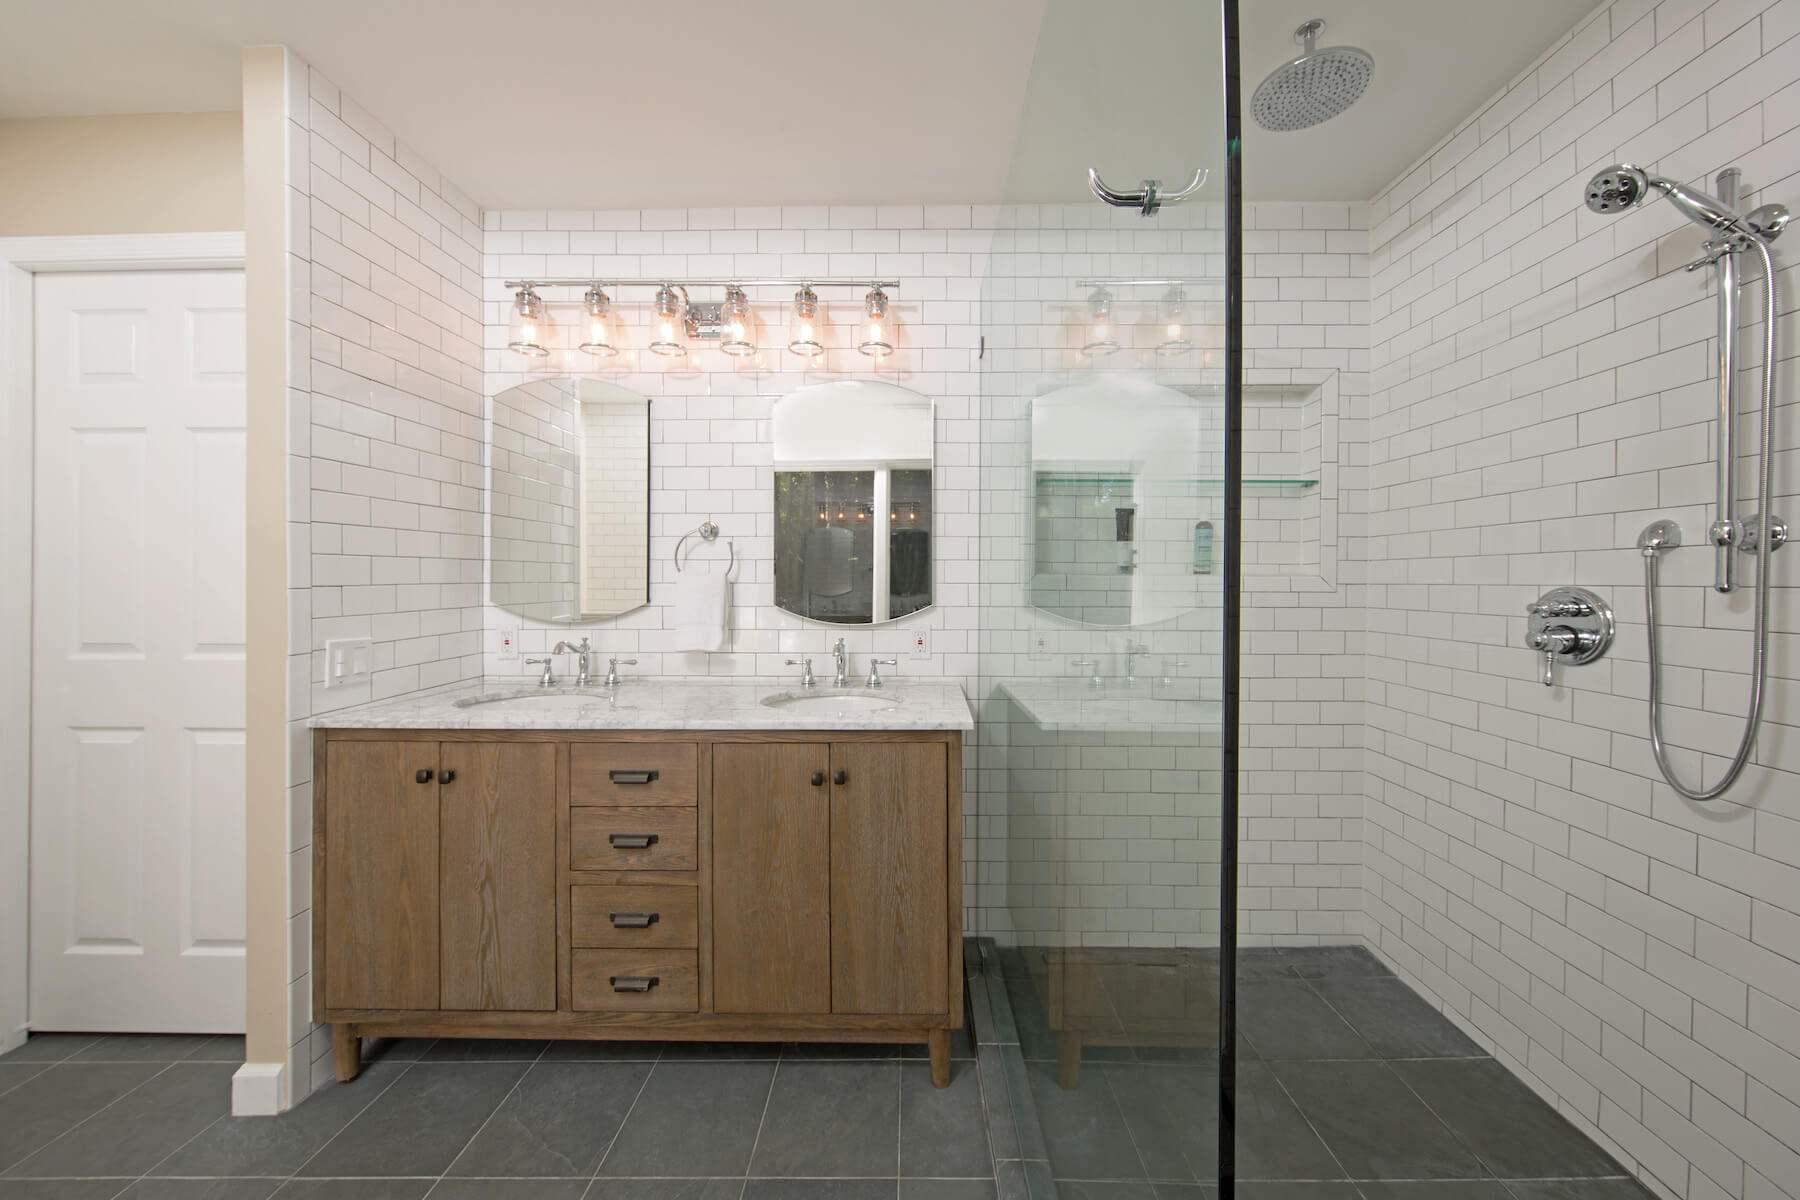 bathroom_R_9-21-17_468